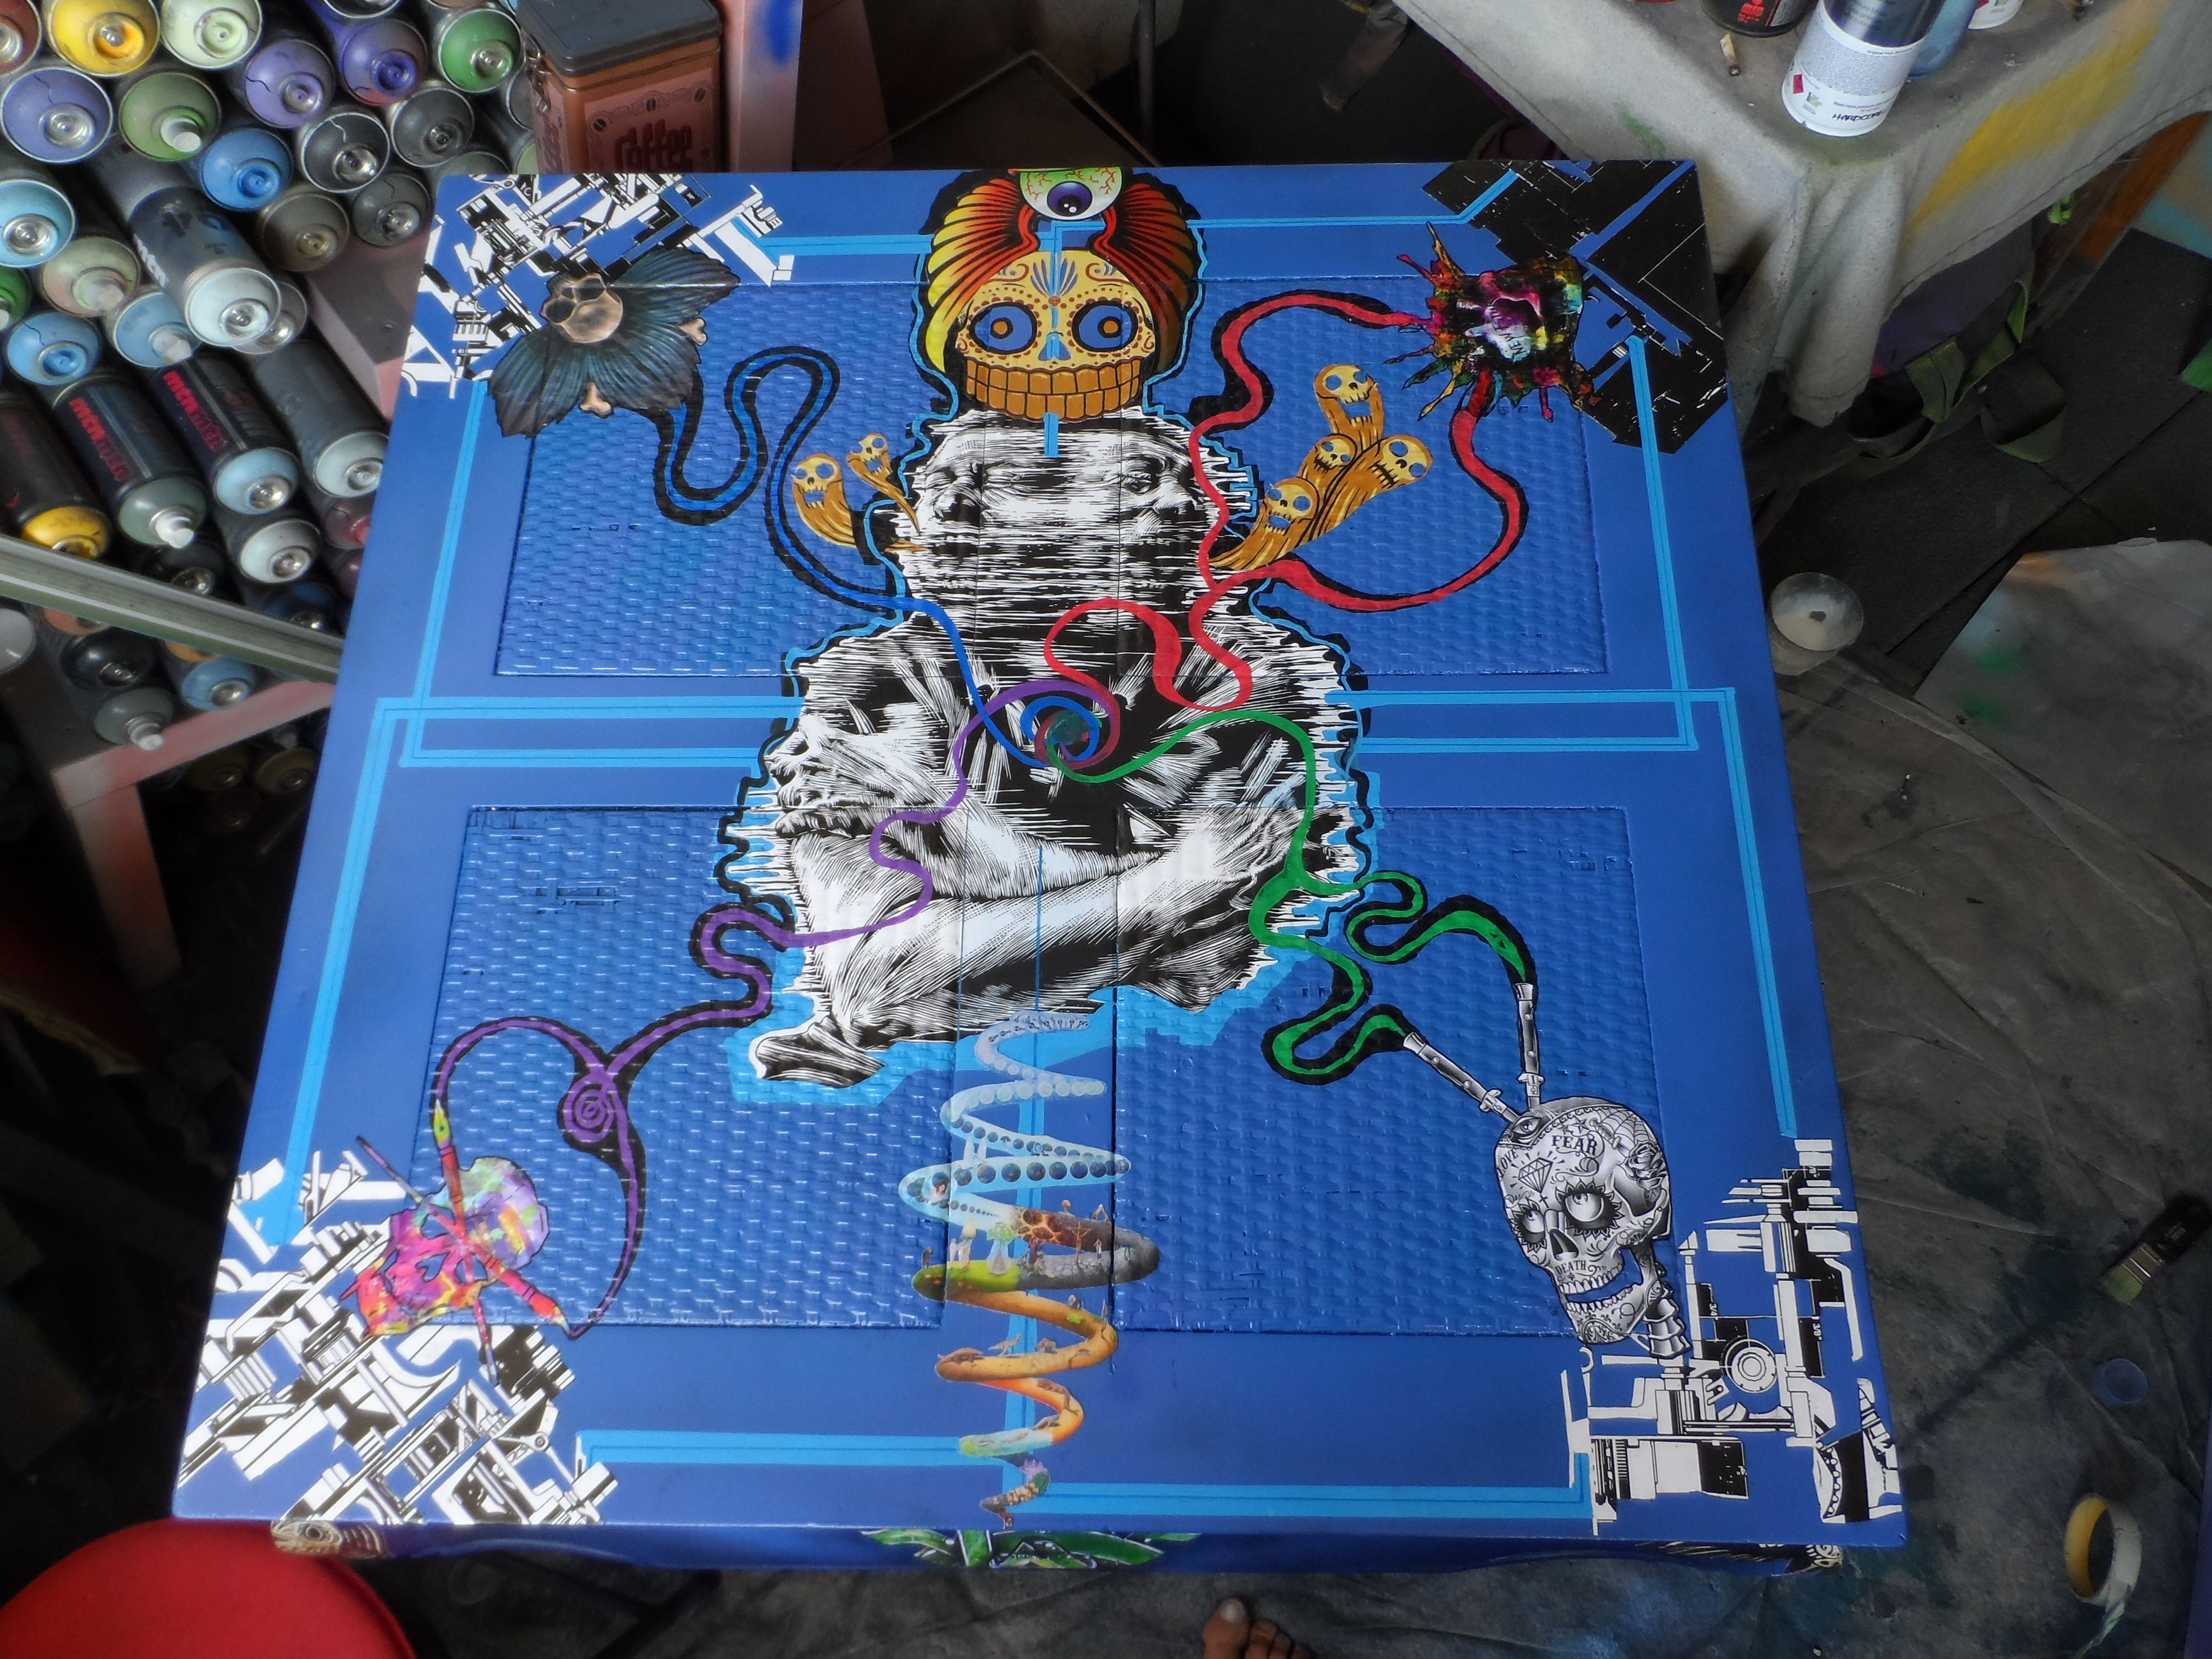 e216fd1cccfe5173fd5adaf1040164b1 Impressionnant De Table Basse Opium Conception